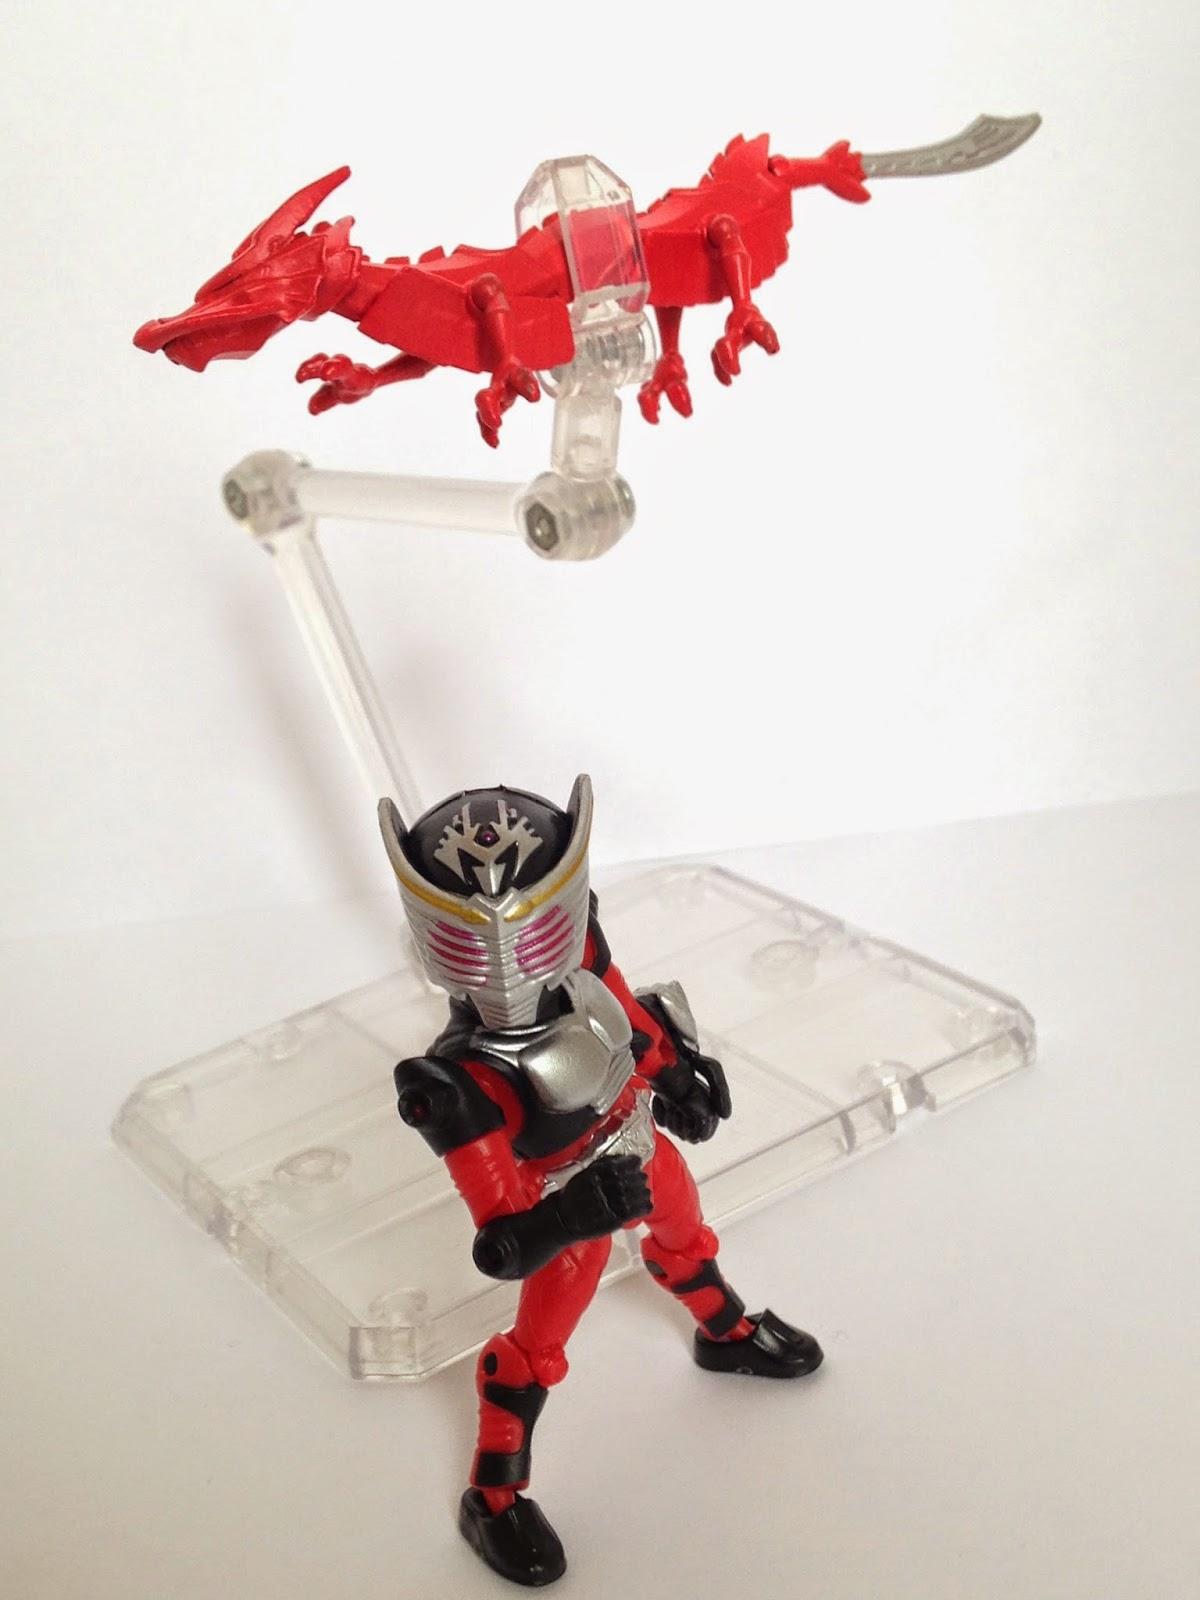 Figure 19 - Kamen Rider Ryuki